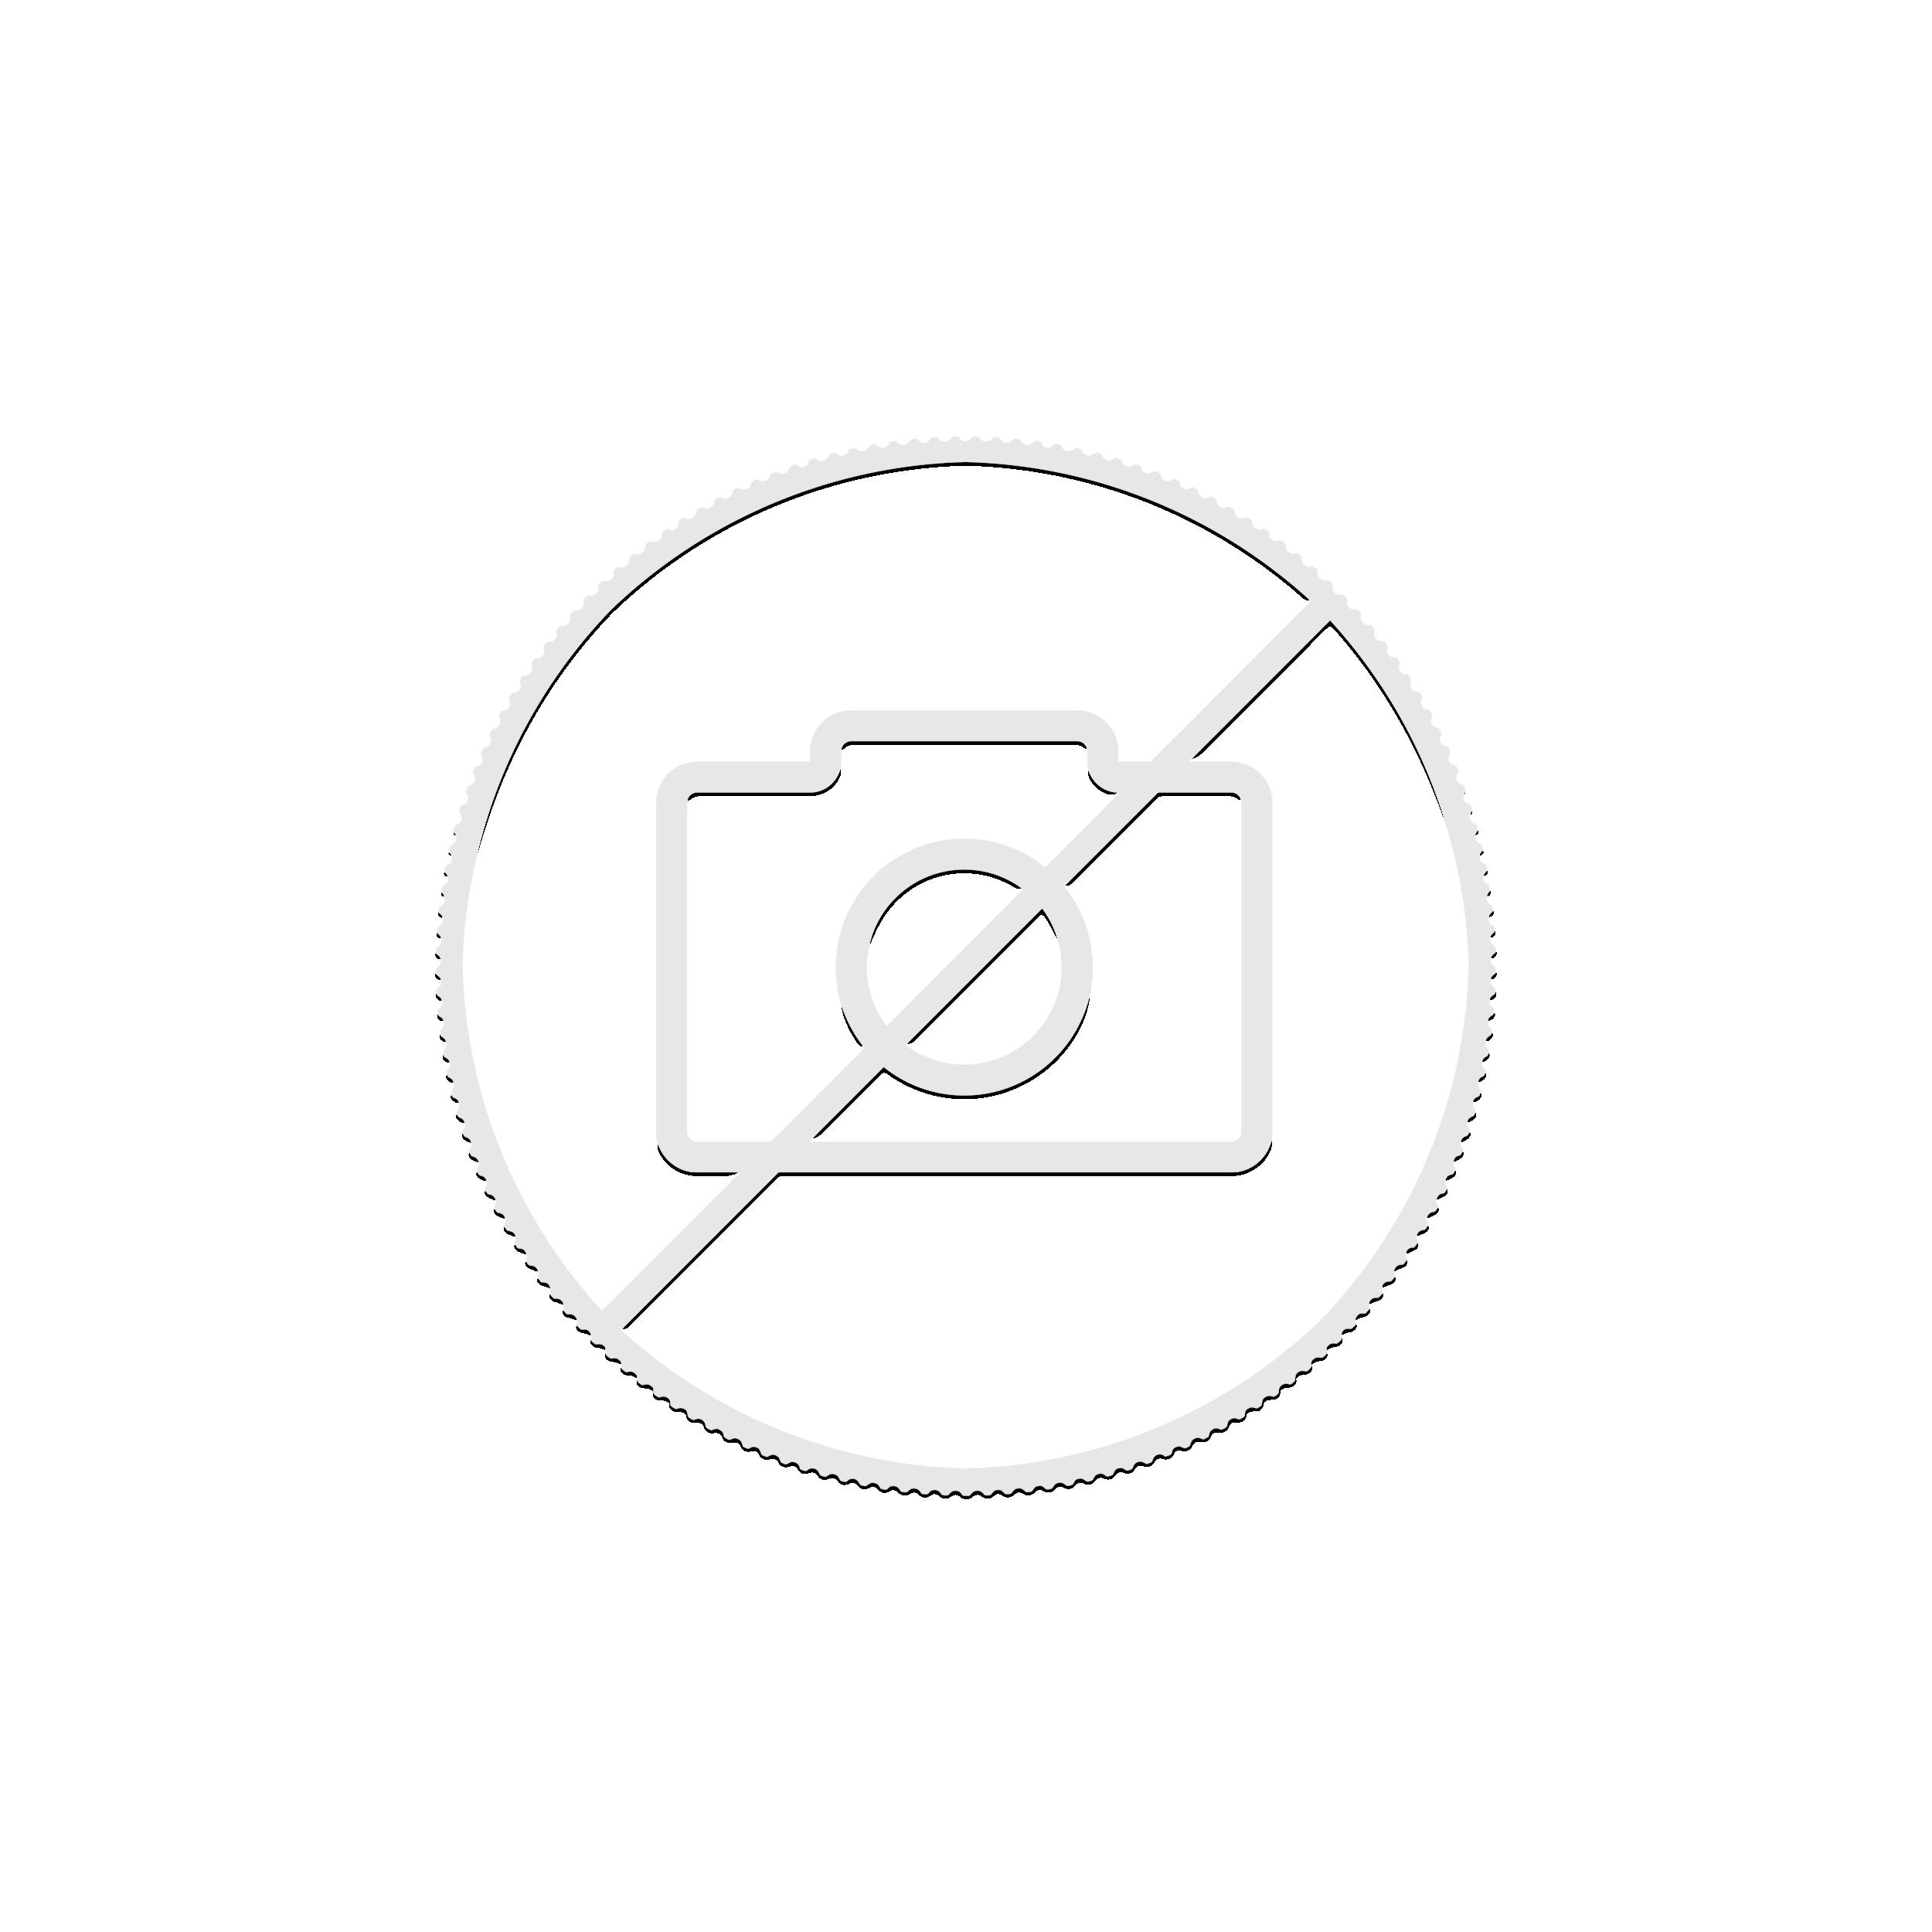 1 Troy ounce silver coin Lunar 2022 Proof